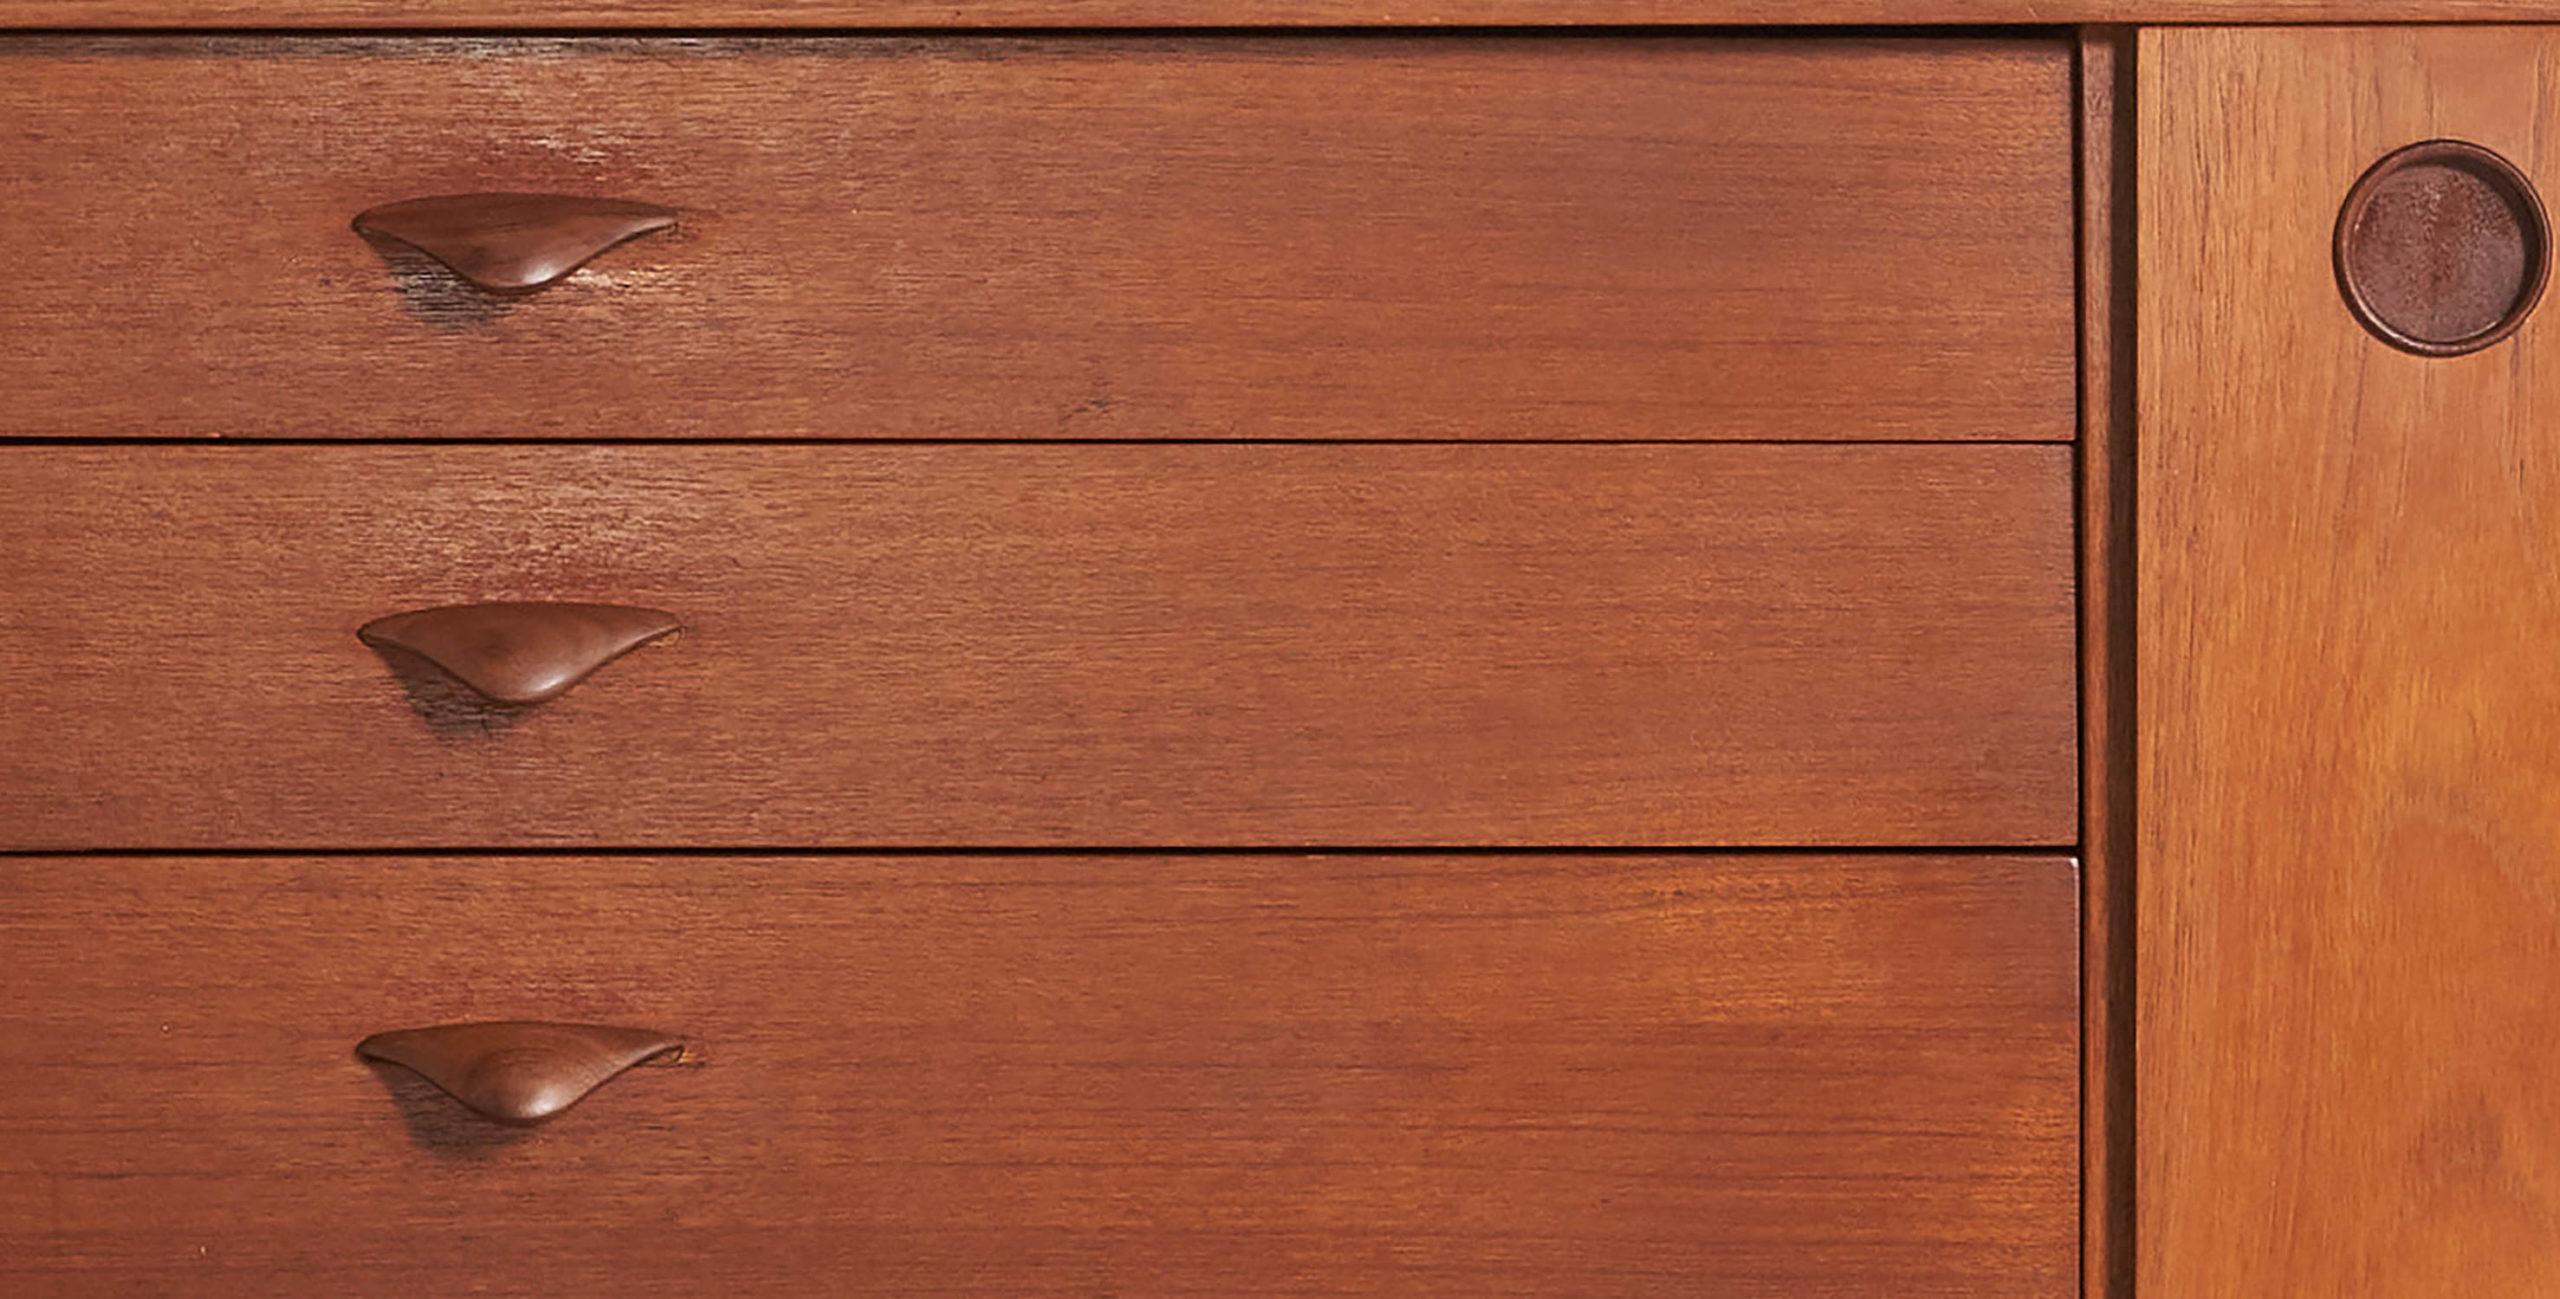 enfilade vintage, enfilade portes coulissantes, enfilade scandinave, enfilade en teck vintage, enfilade portes coulissantes vintage, enfilade anglaise